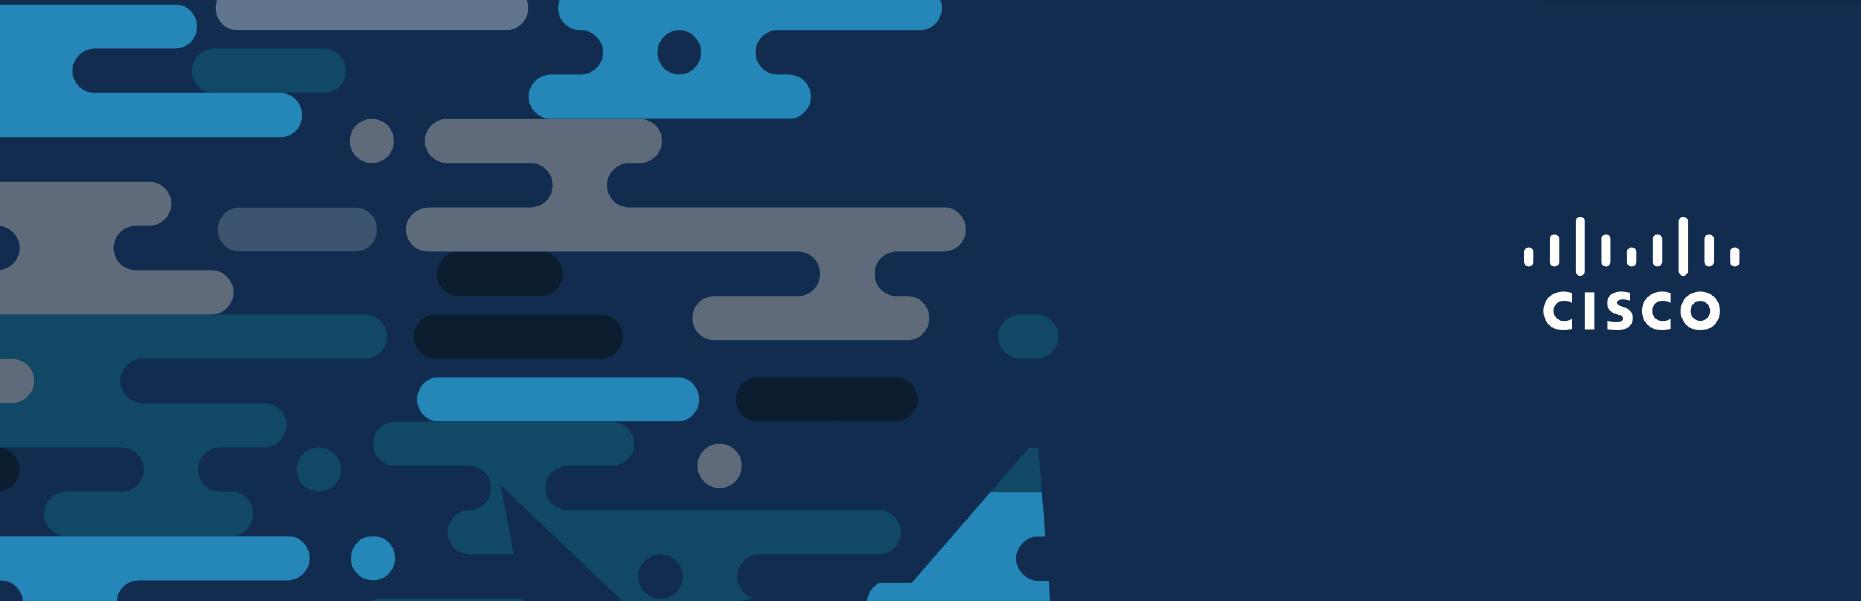 Cisco-report-3